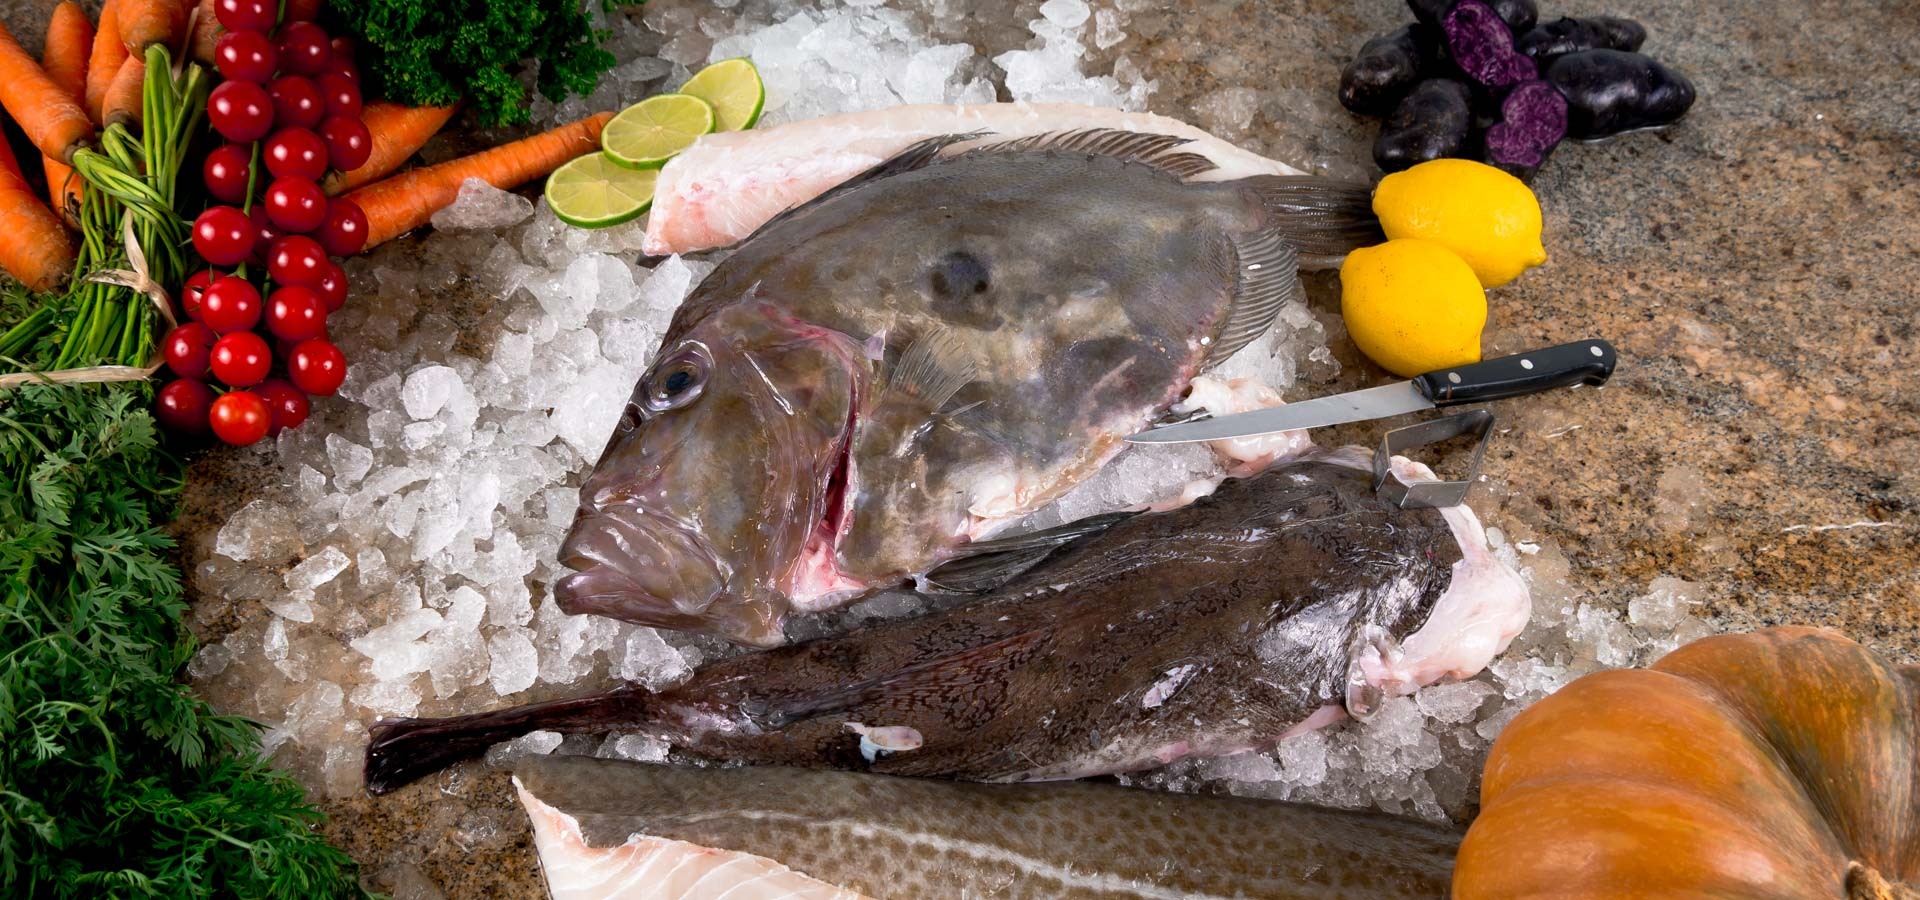 poisson-frais-fruits-legumes-locaux